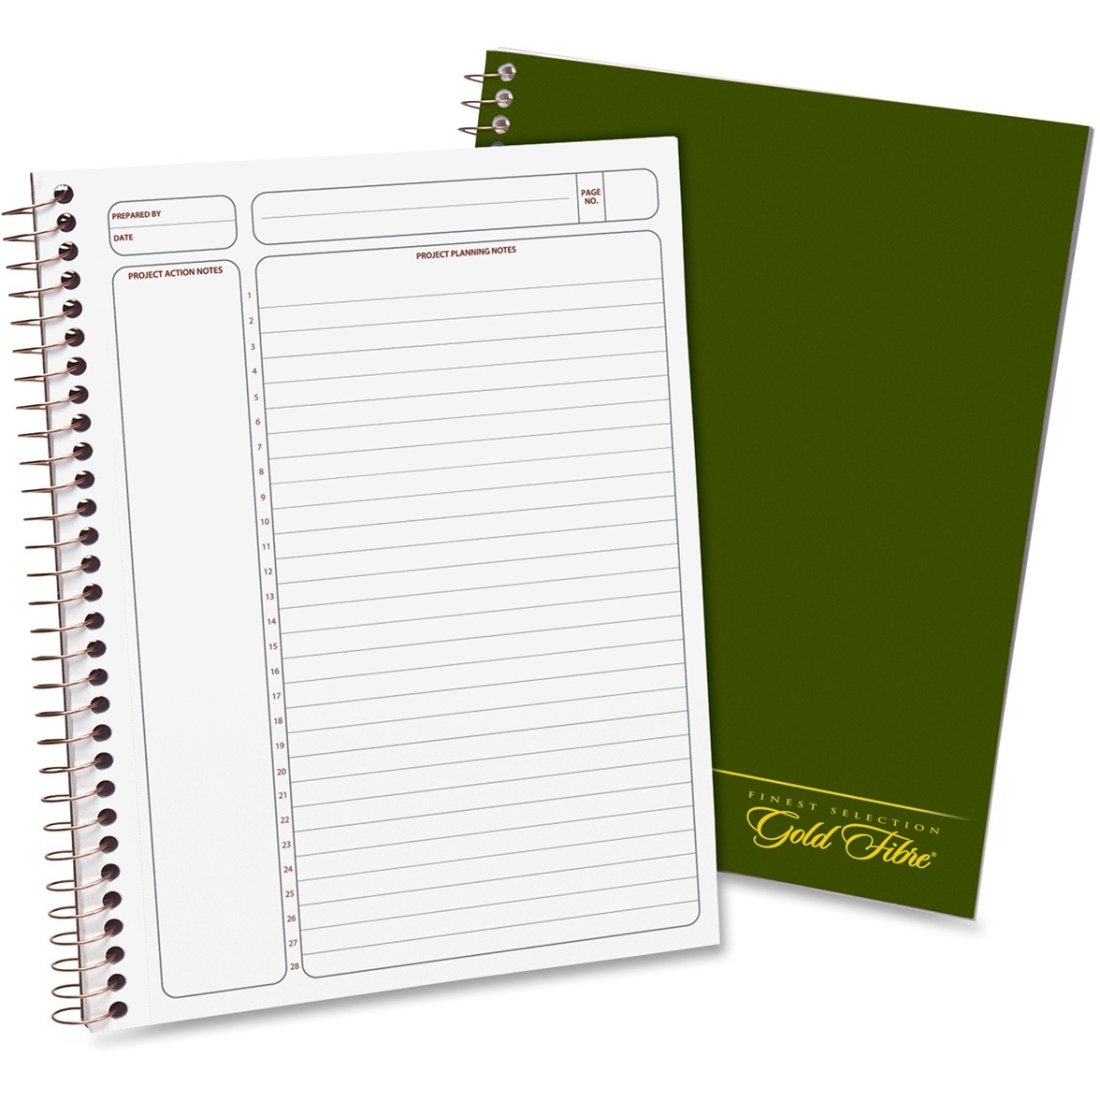 Amazon.com : Ampad Gold Fibre Classic Project Planner - 3 Pack ...